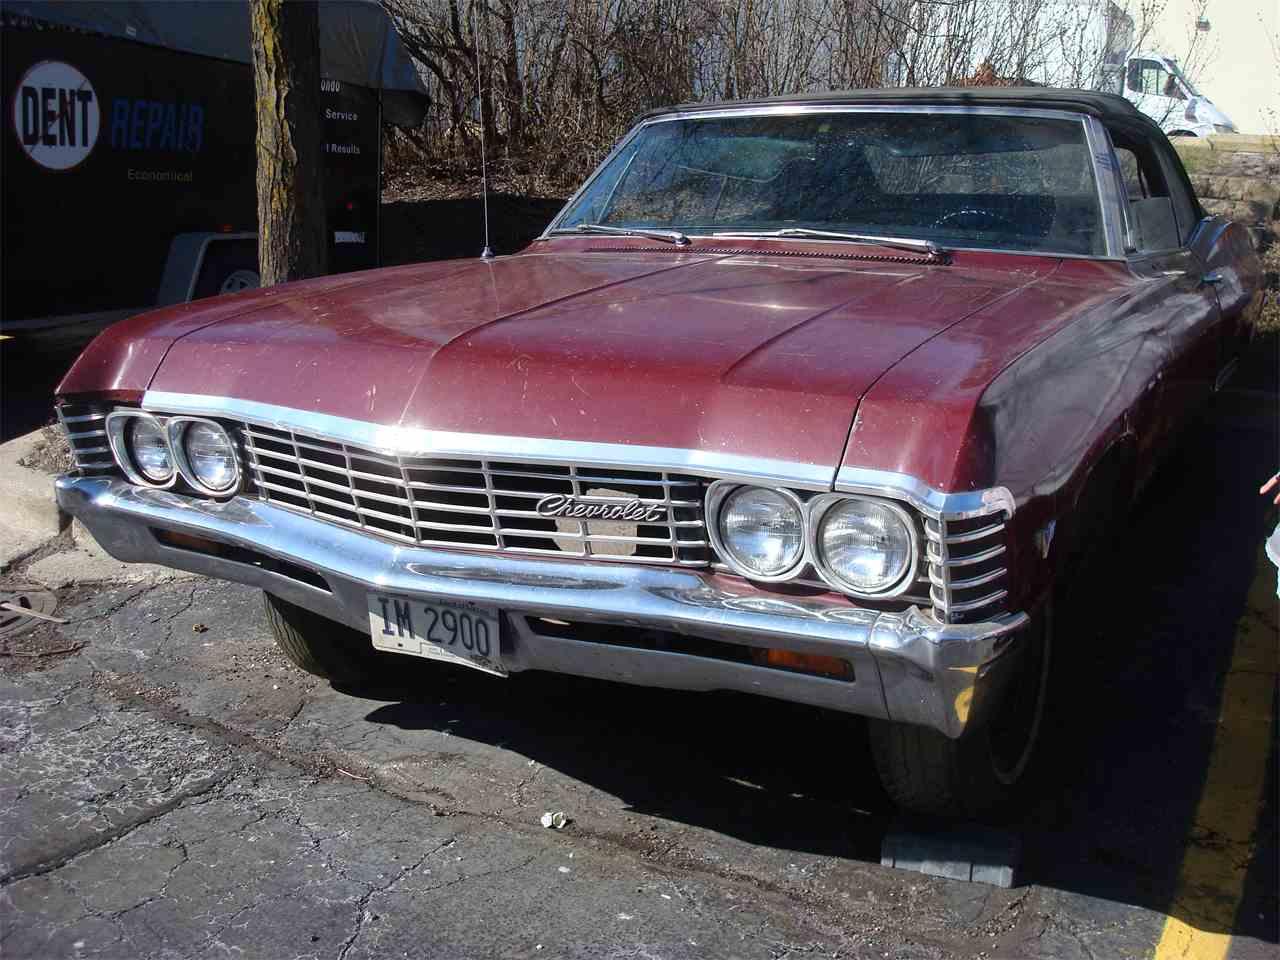 1967 chevrolet impala for sale cc 997175. Black Bedroom Furniture Sets. Home Design Ideas